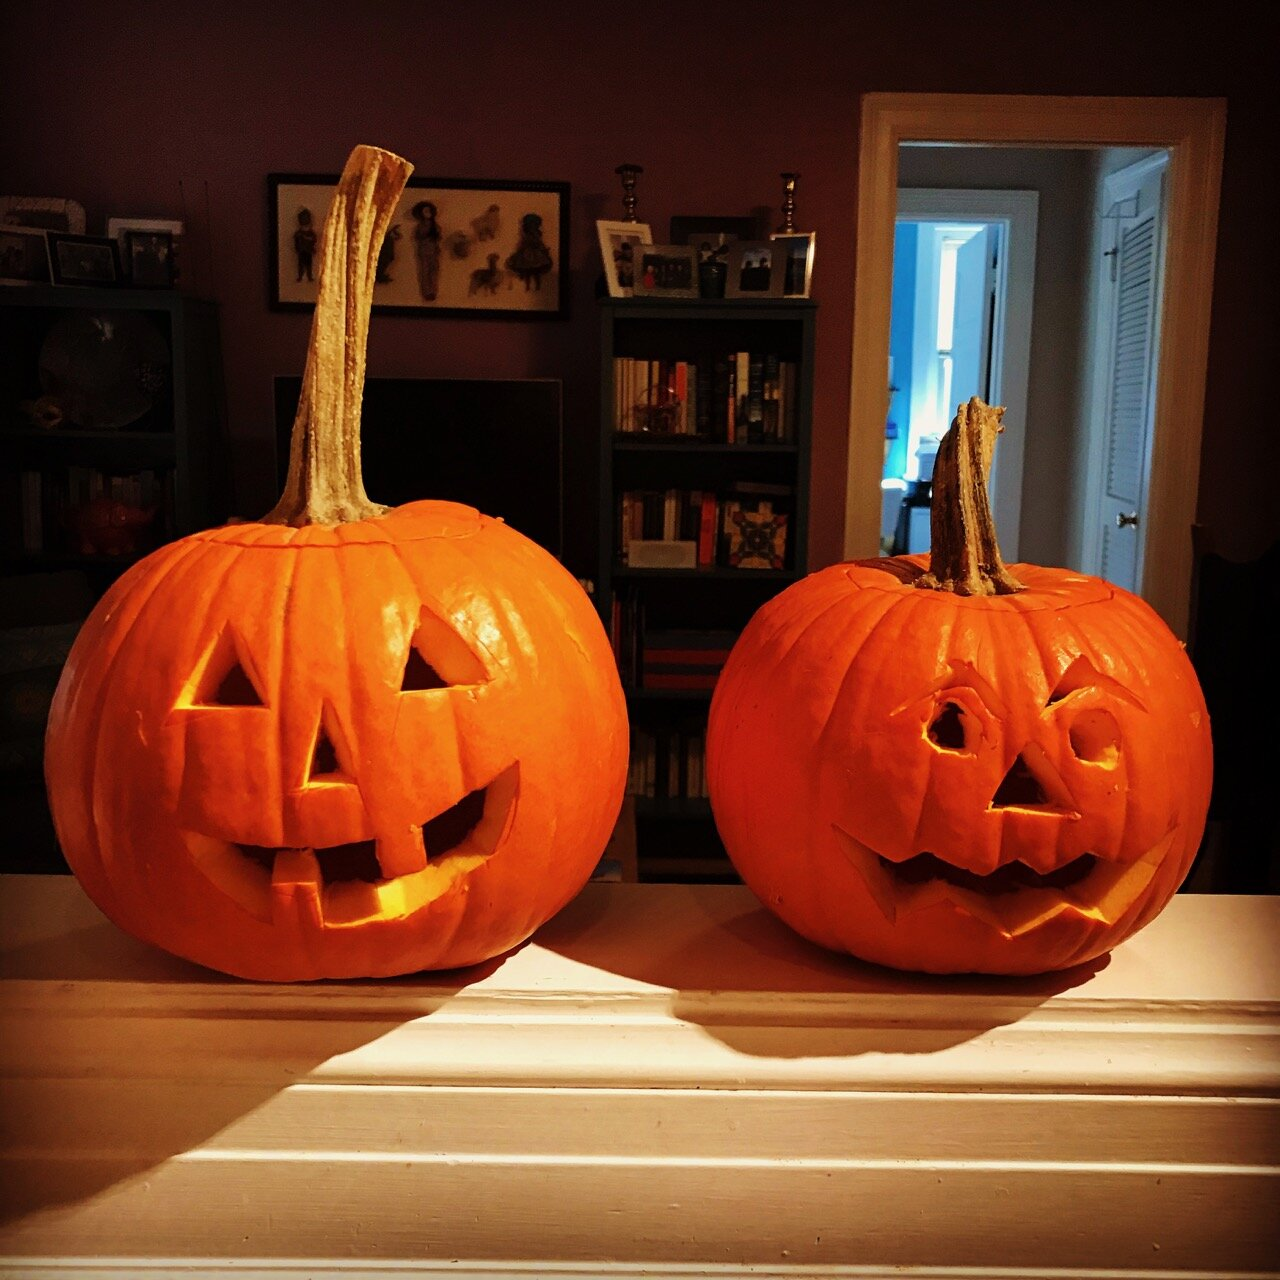 Volume 2: Halloween, Life Sabbatical Blog Series, New Workshop & More! - October 2017